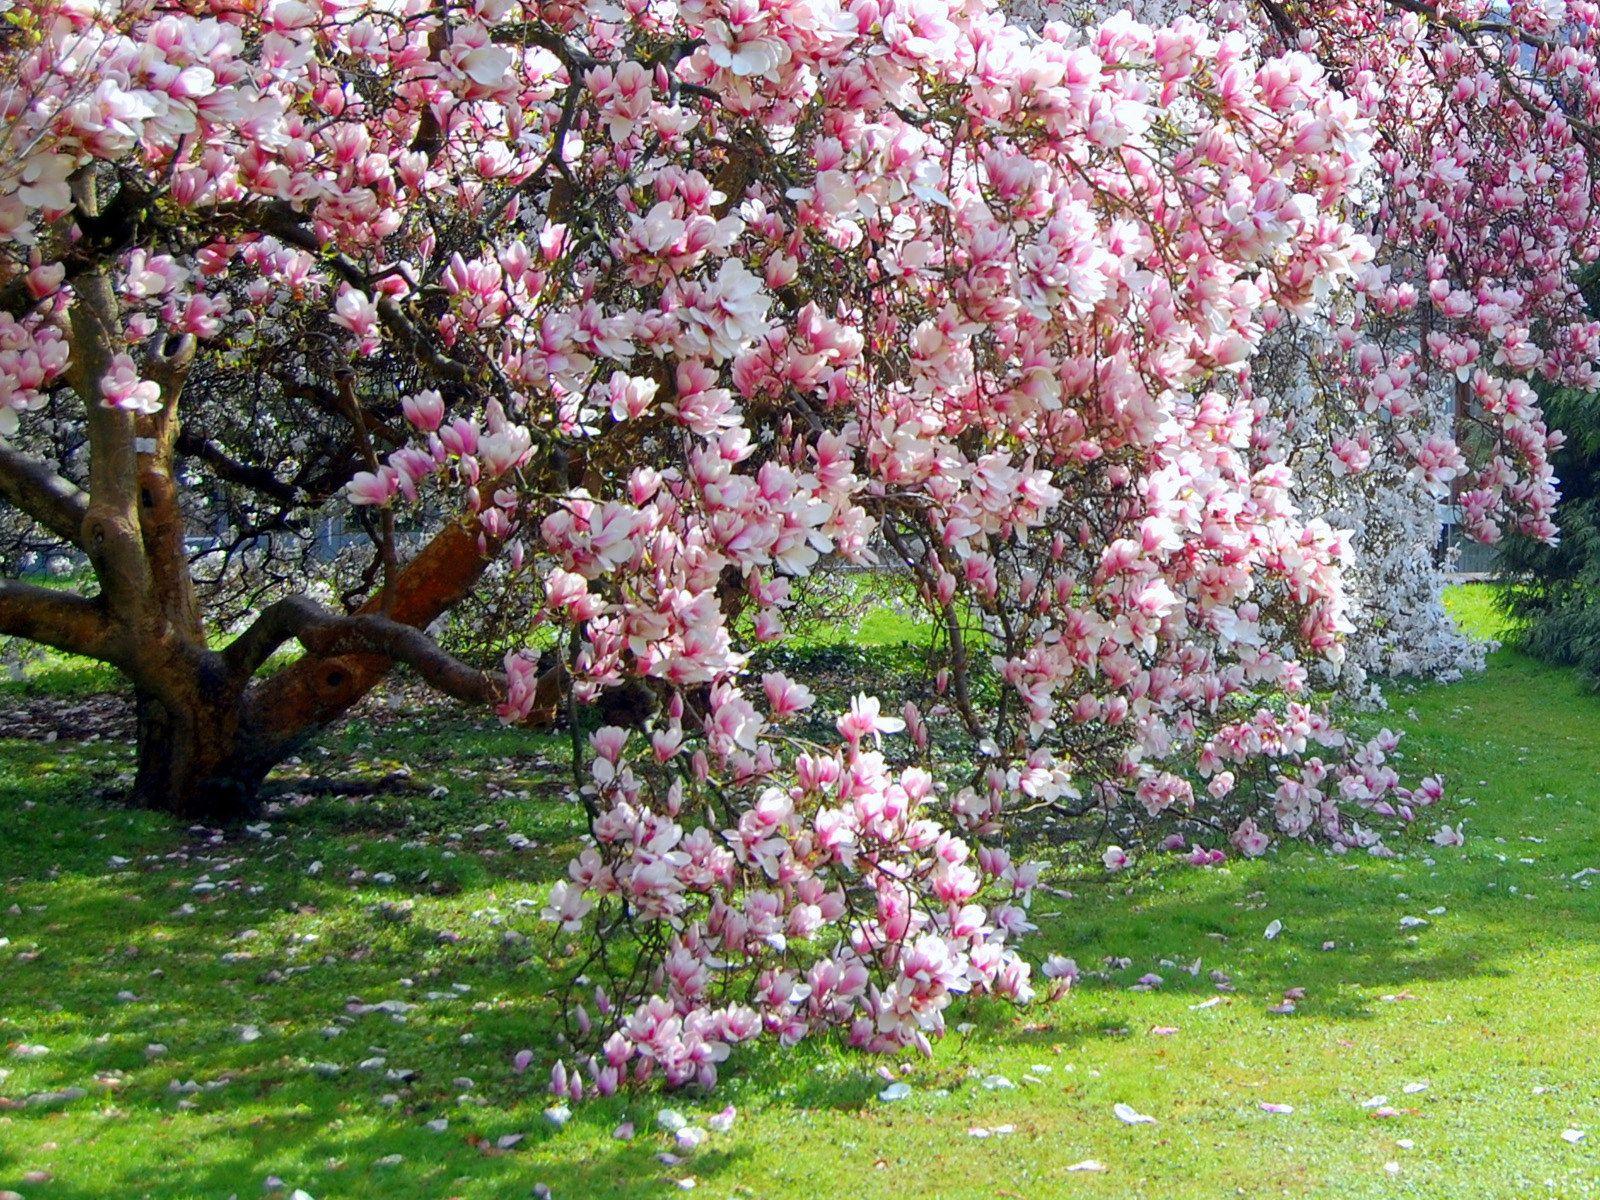 gardens with magnolia trees 25 healing backyard ideas to feng shui homes. Interior Design Ideas. Home Design Ideas